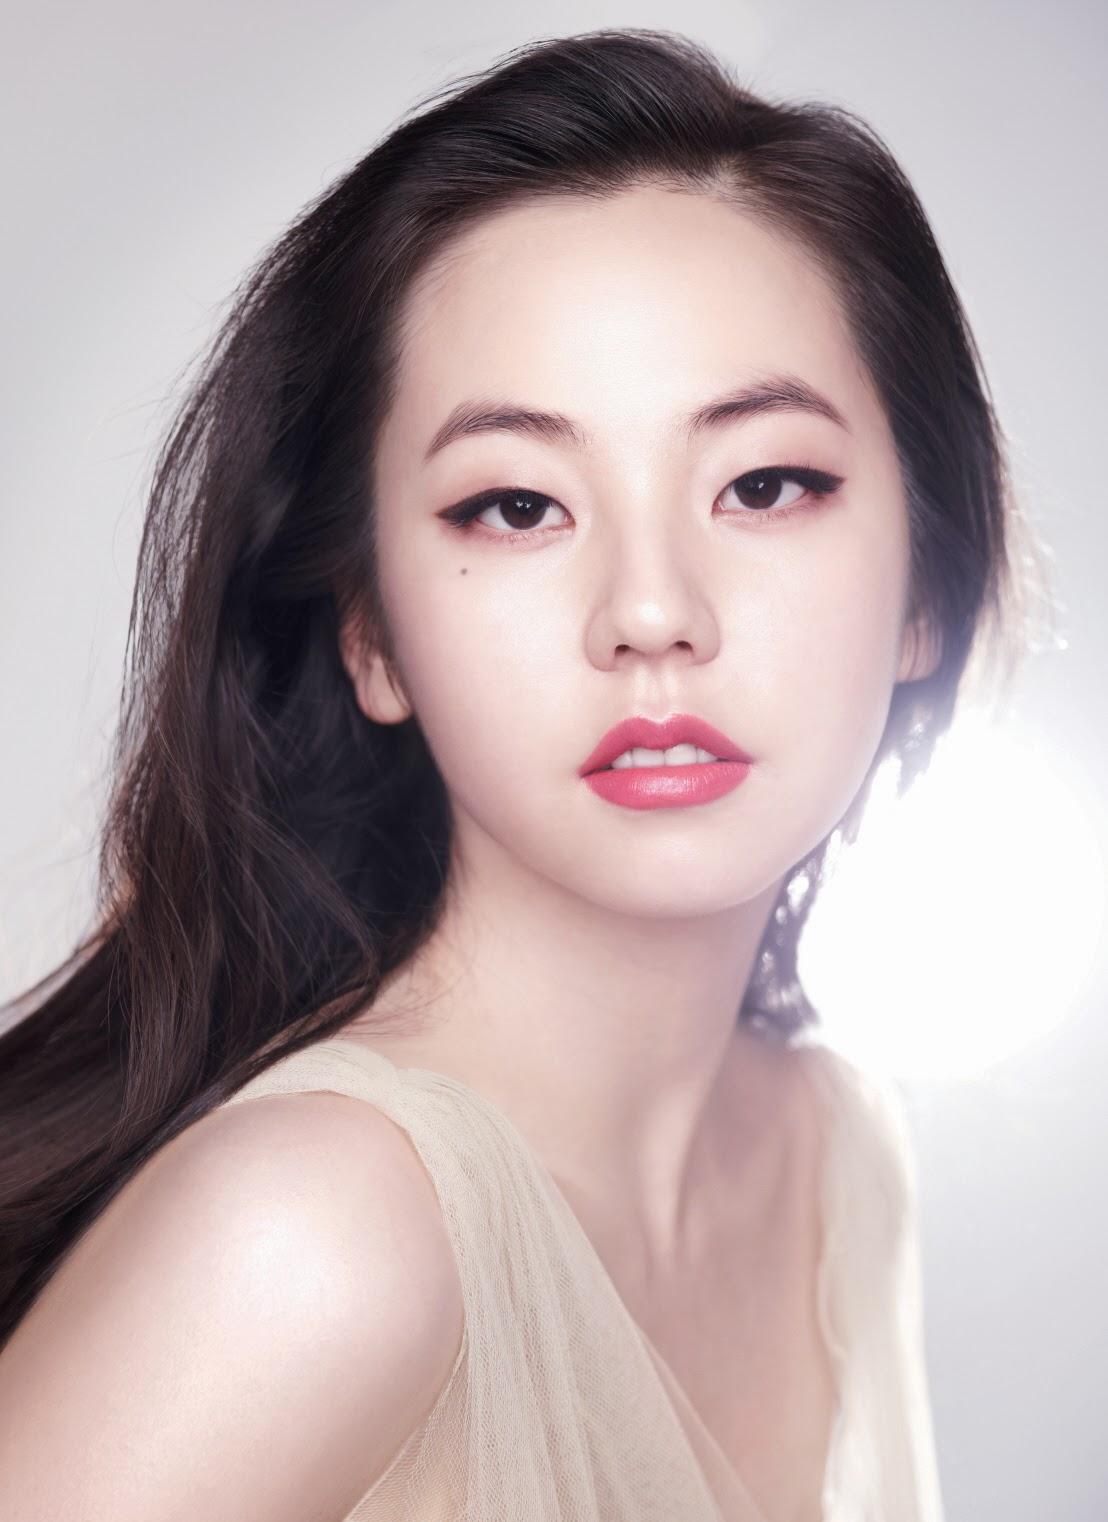 Sohee Wonder Girls VDL Cosmetics